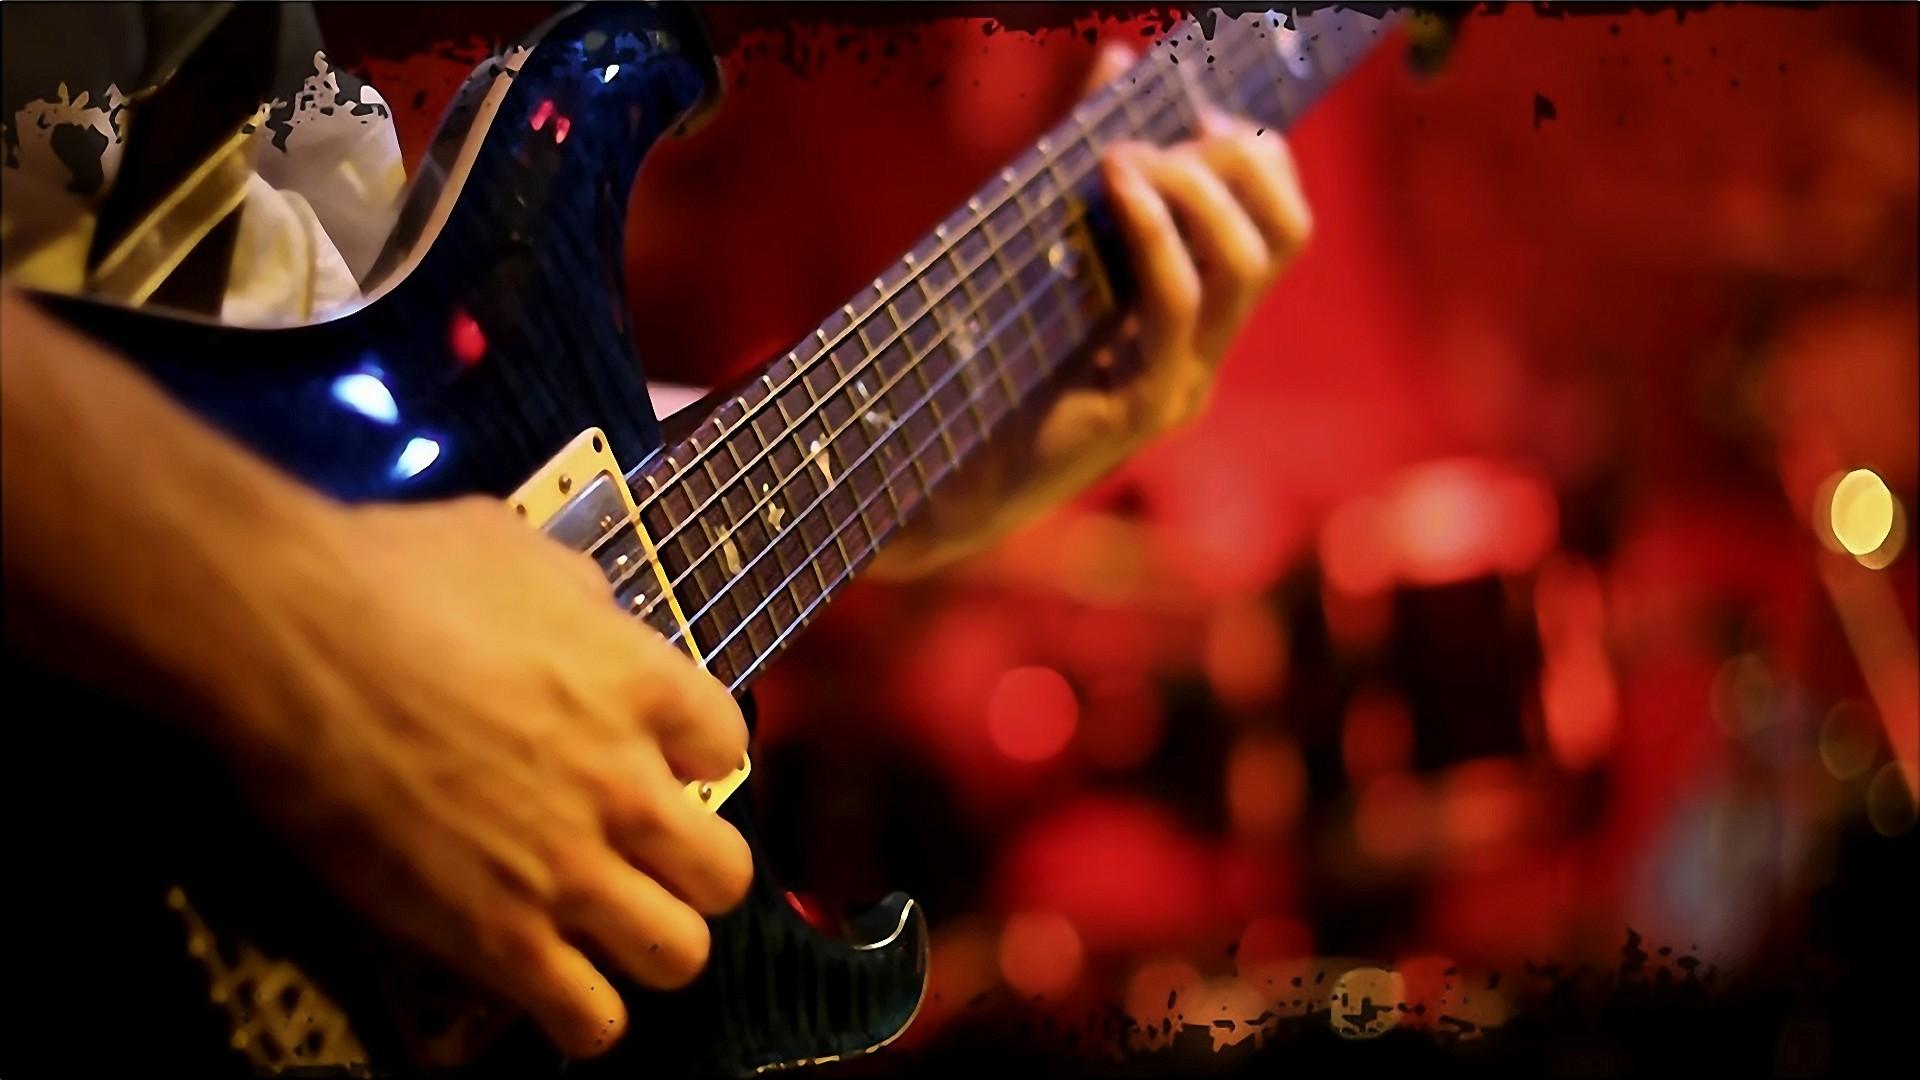 Music Guitar Wallpapers Group 1024×768 3D Guitar Wallpapers (49 Wallpapers)  | Adorable